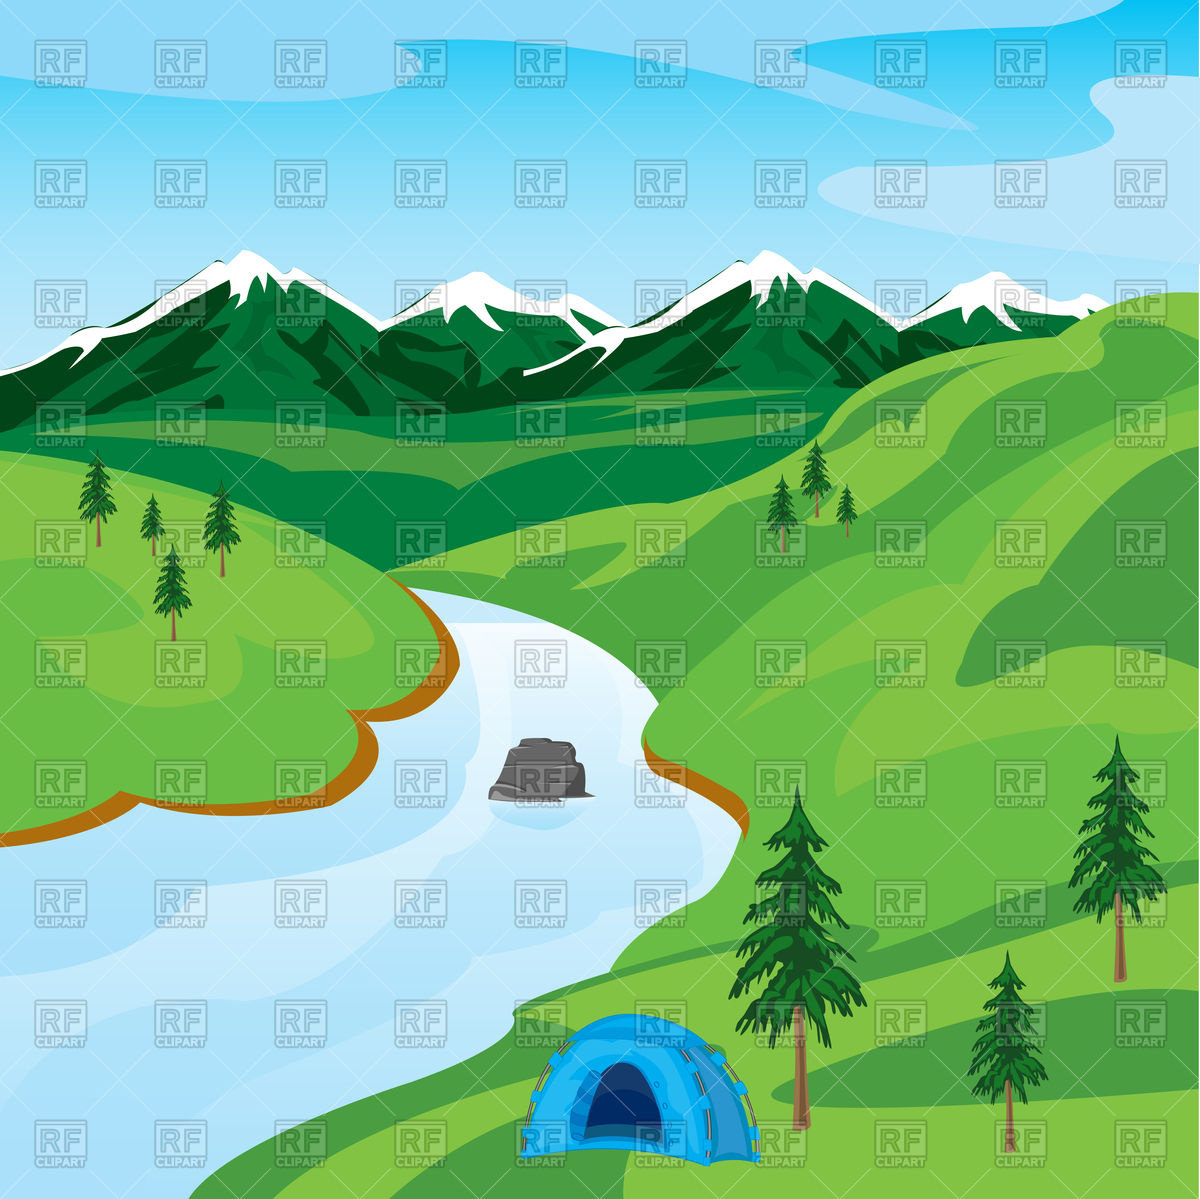 Clipart River & River Clip Art Images - ClipartALL.com image freeuse